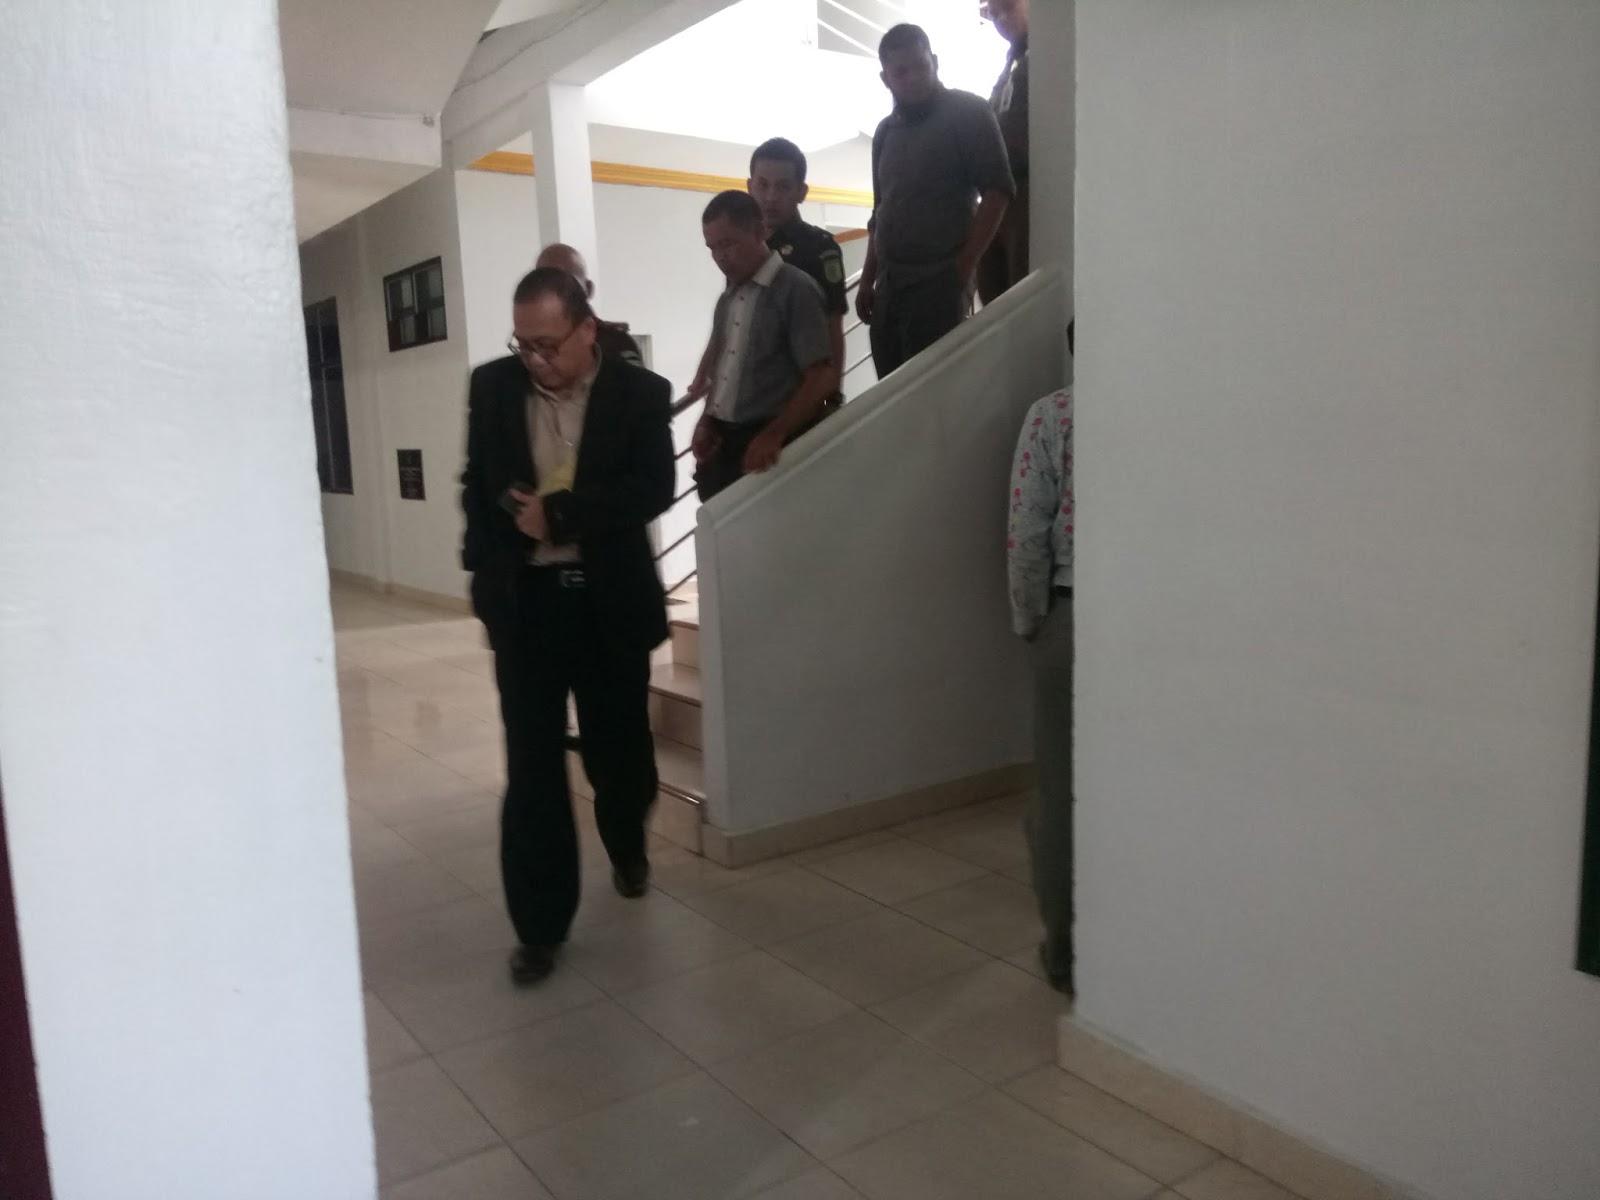 Direktur CV Mandiri M Yusuf saat keluar dari ruang penyidikan Kejaksaan Negeri Labuhanbatu, Rabu (14/2).